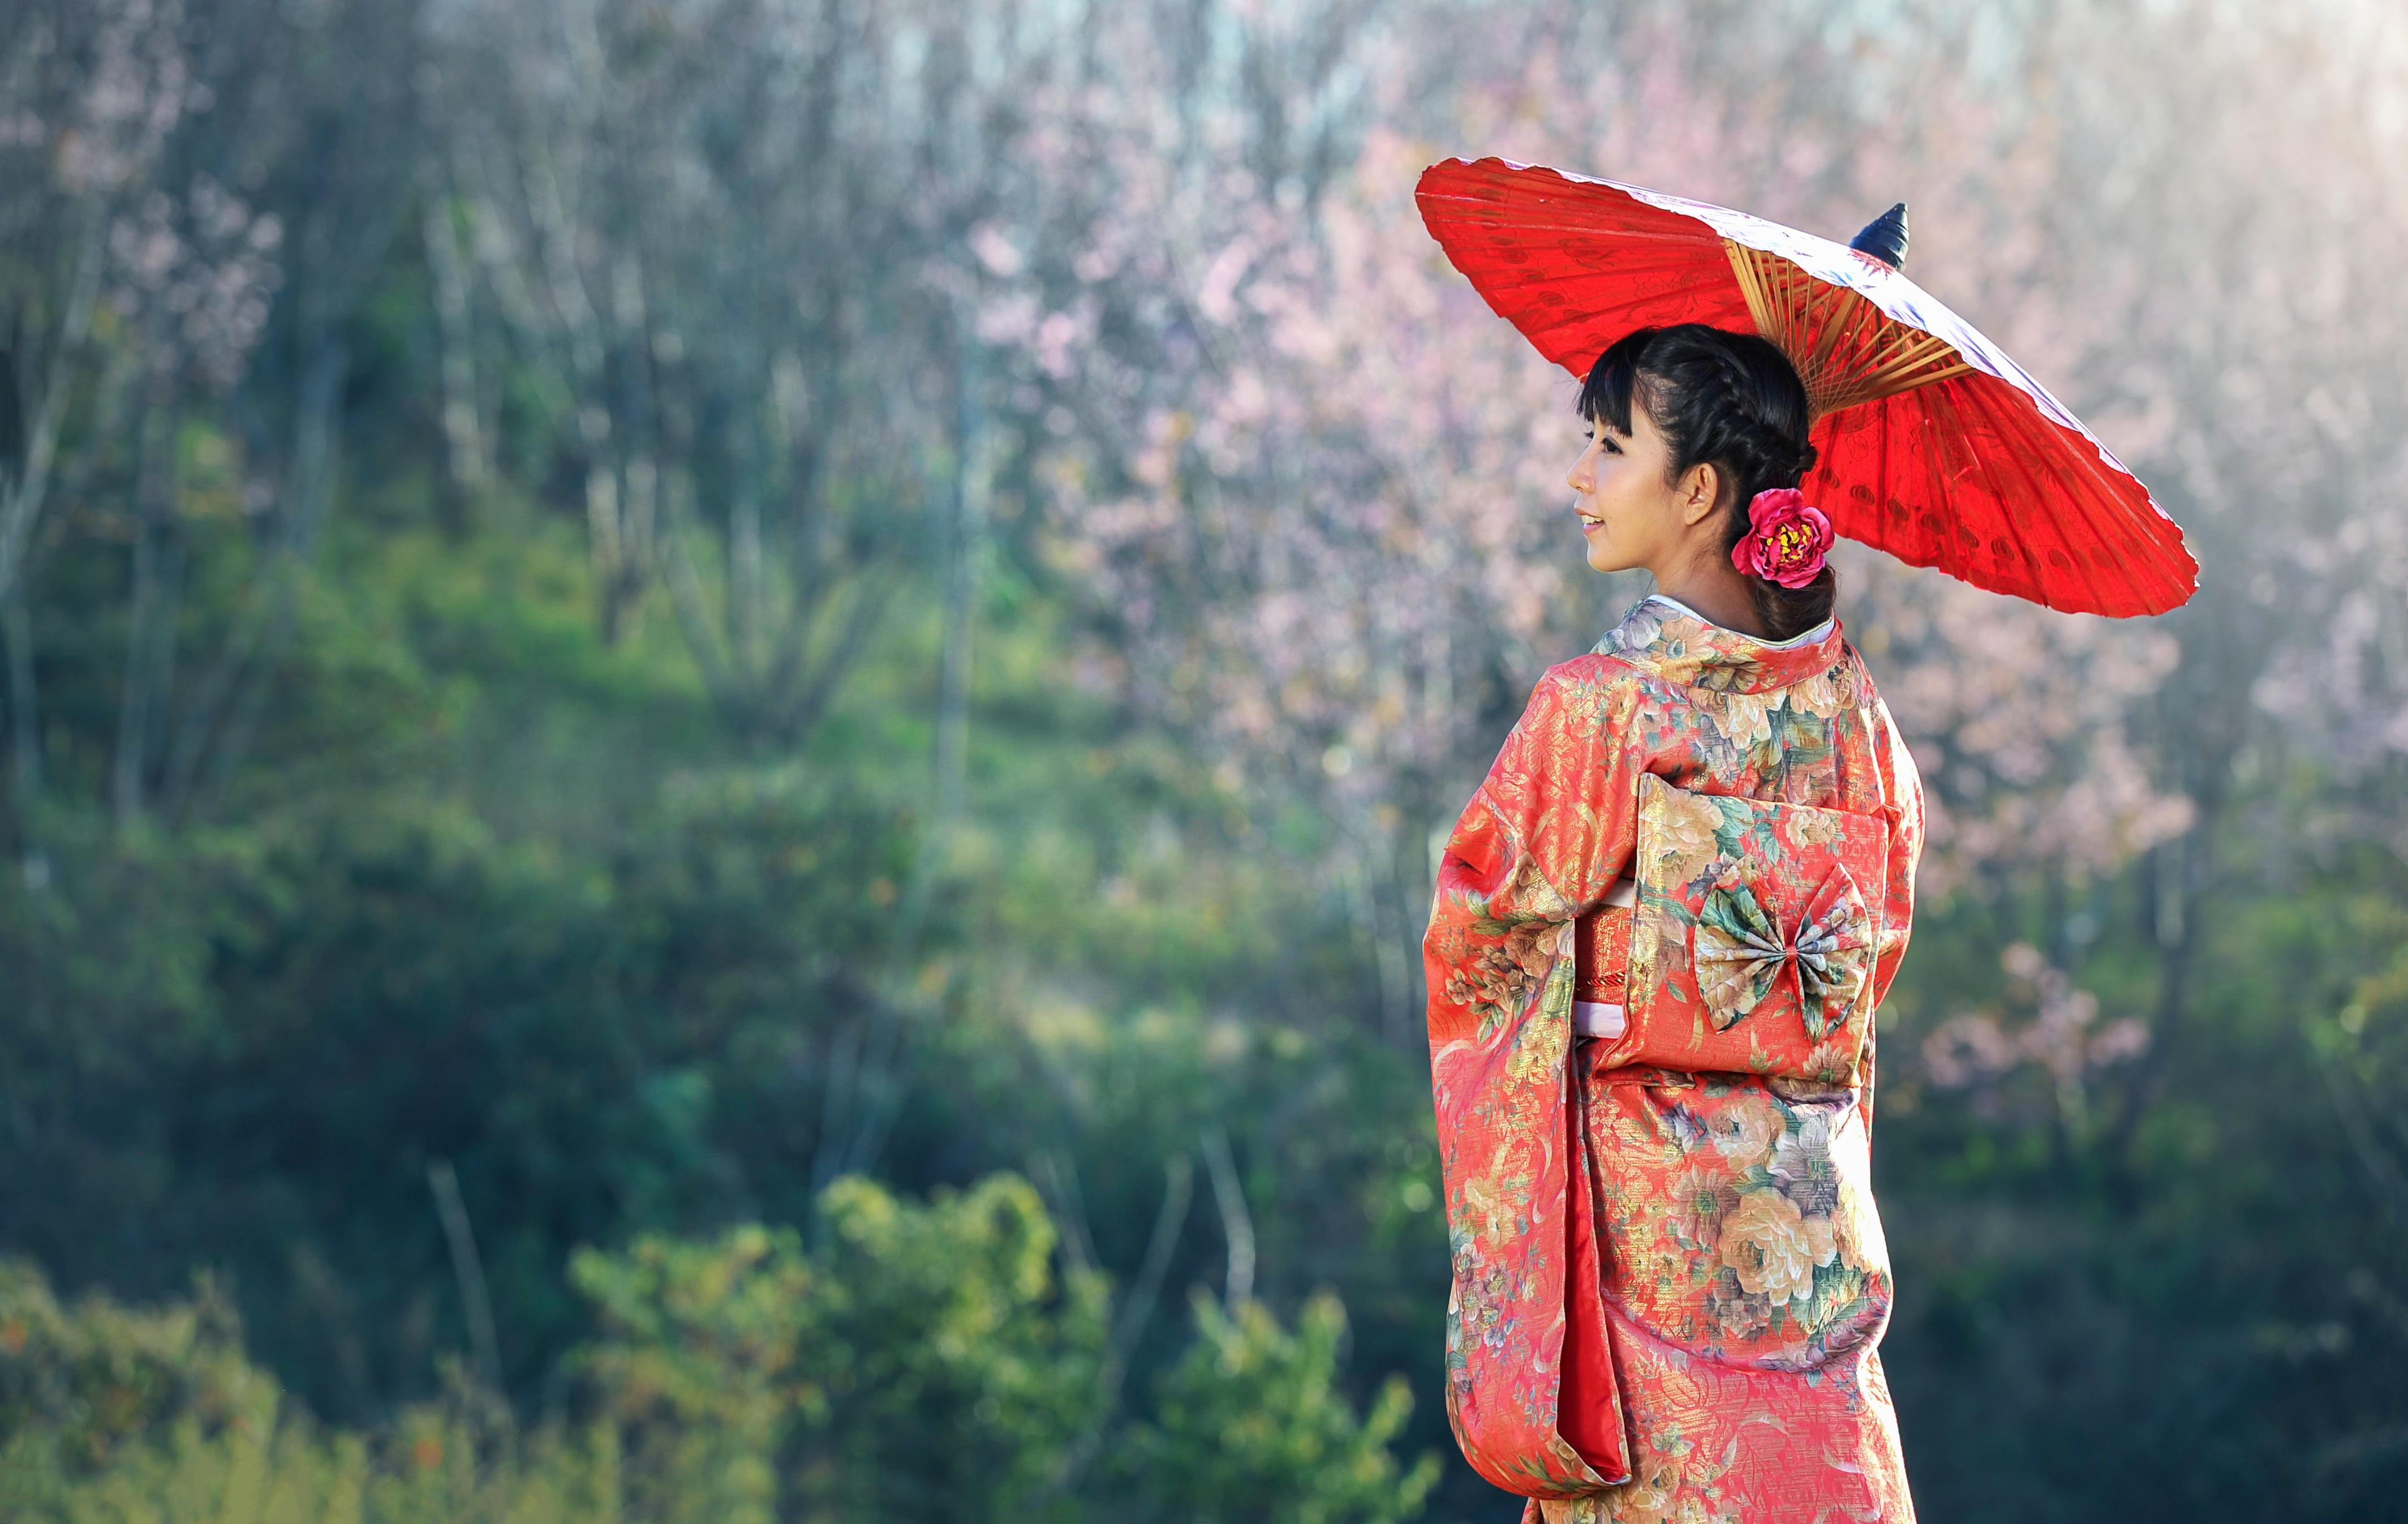 Photo of a woman wearing yukata and red paper umbrella HD 4256x2693